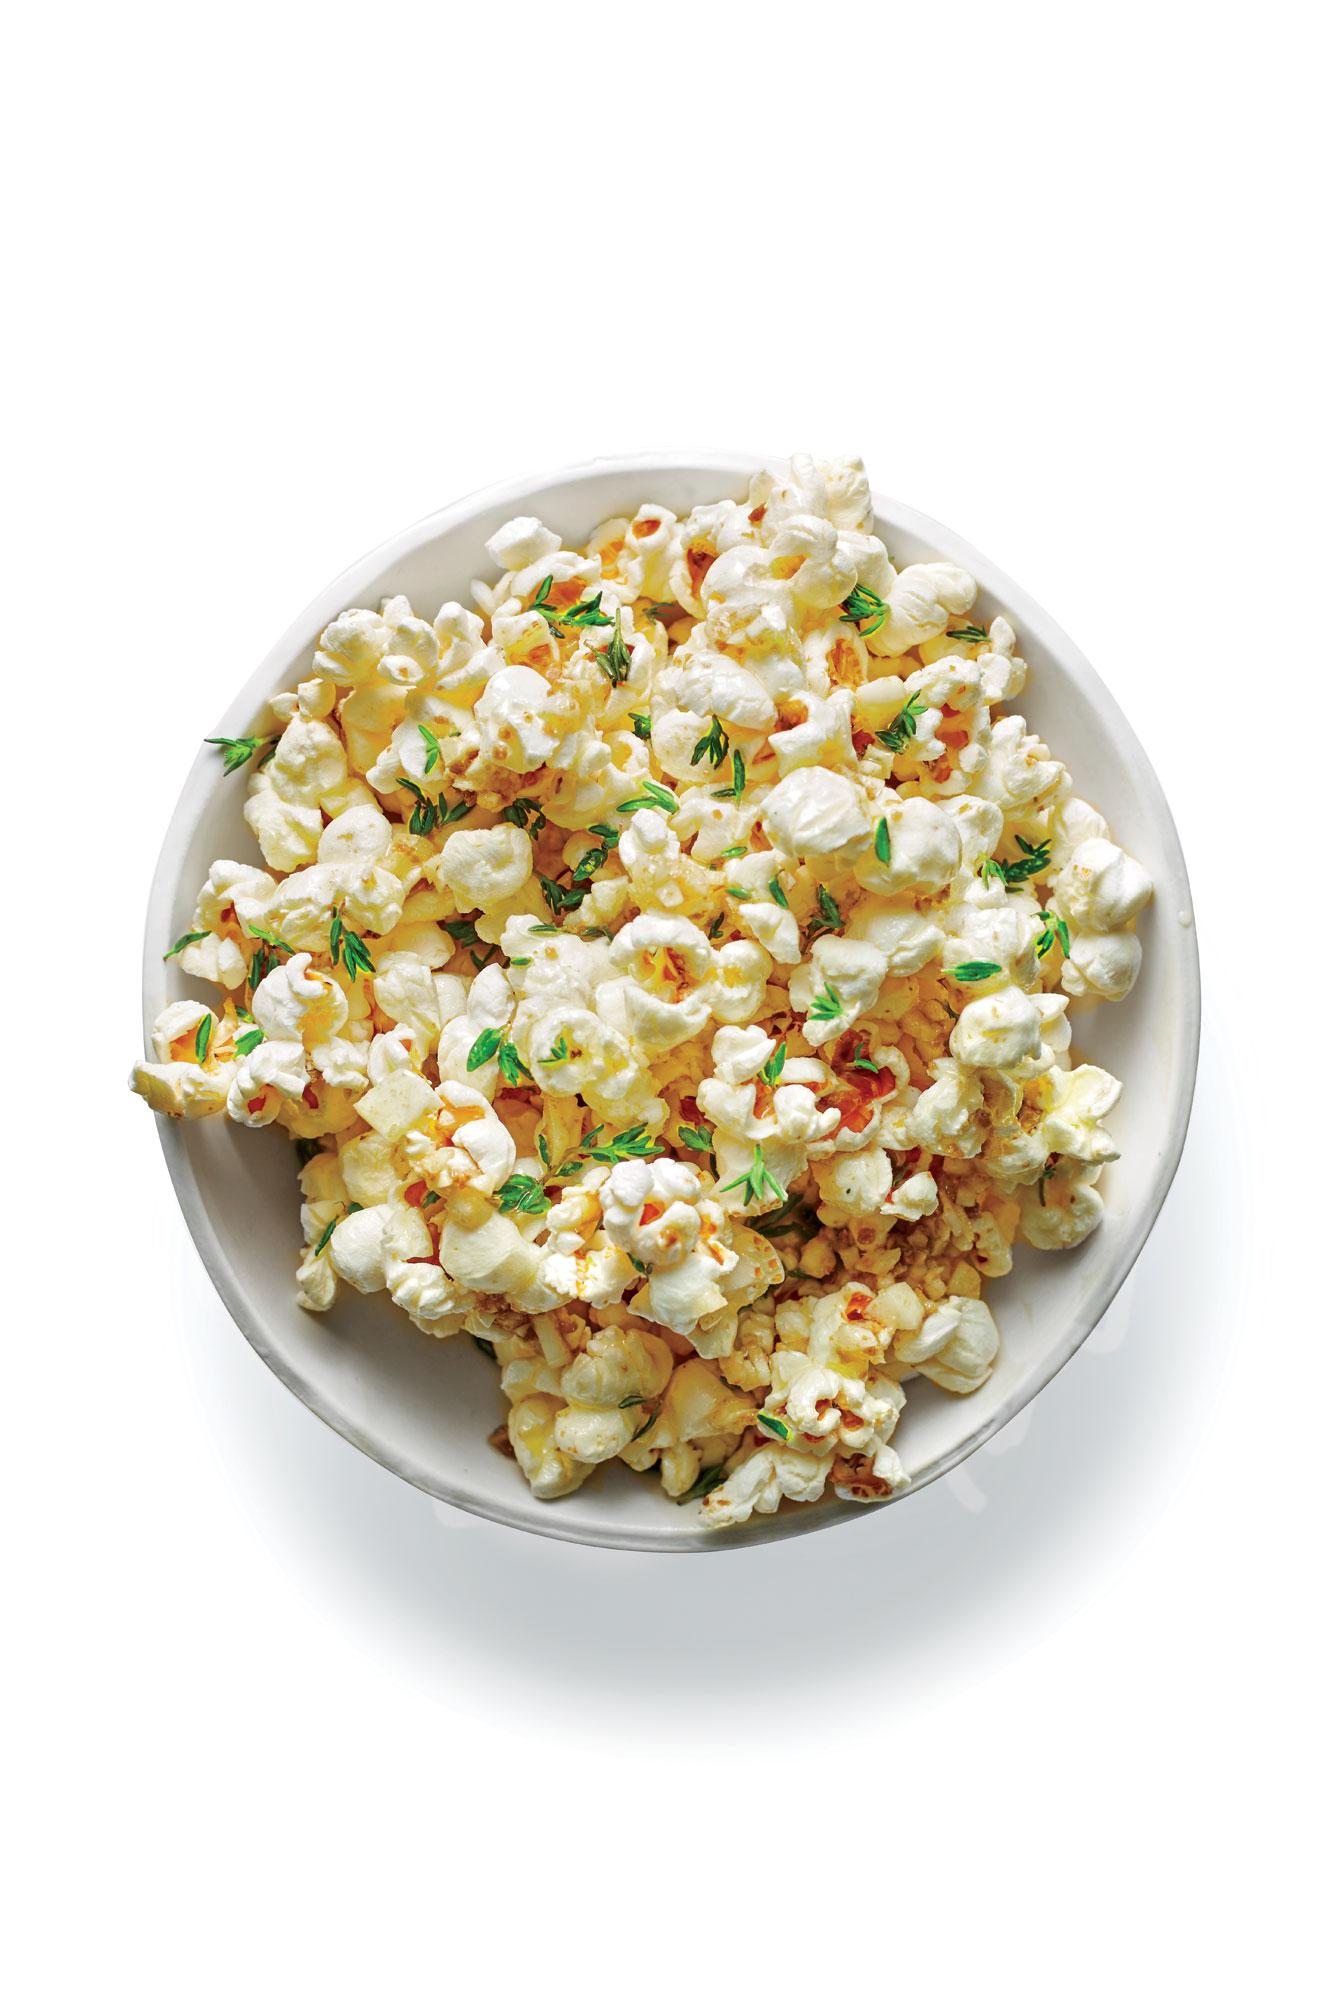 ck- Umami Popcorn